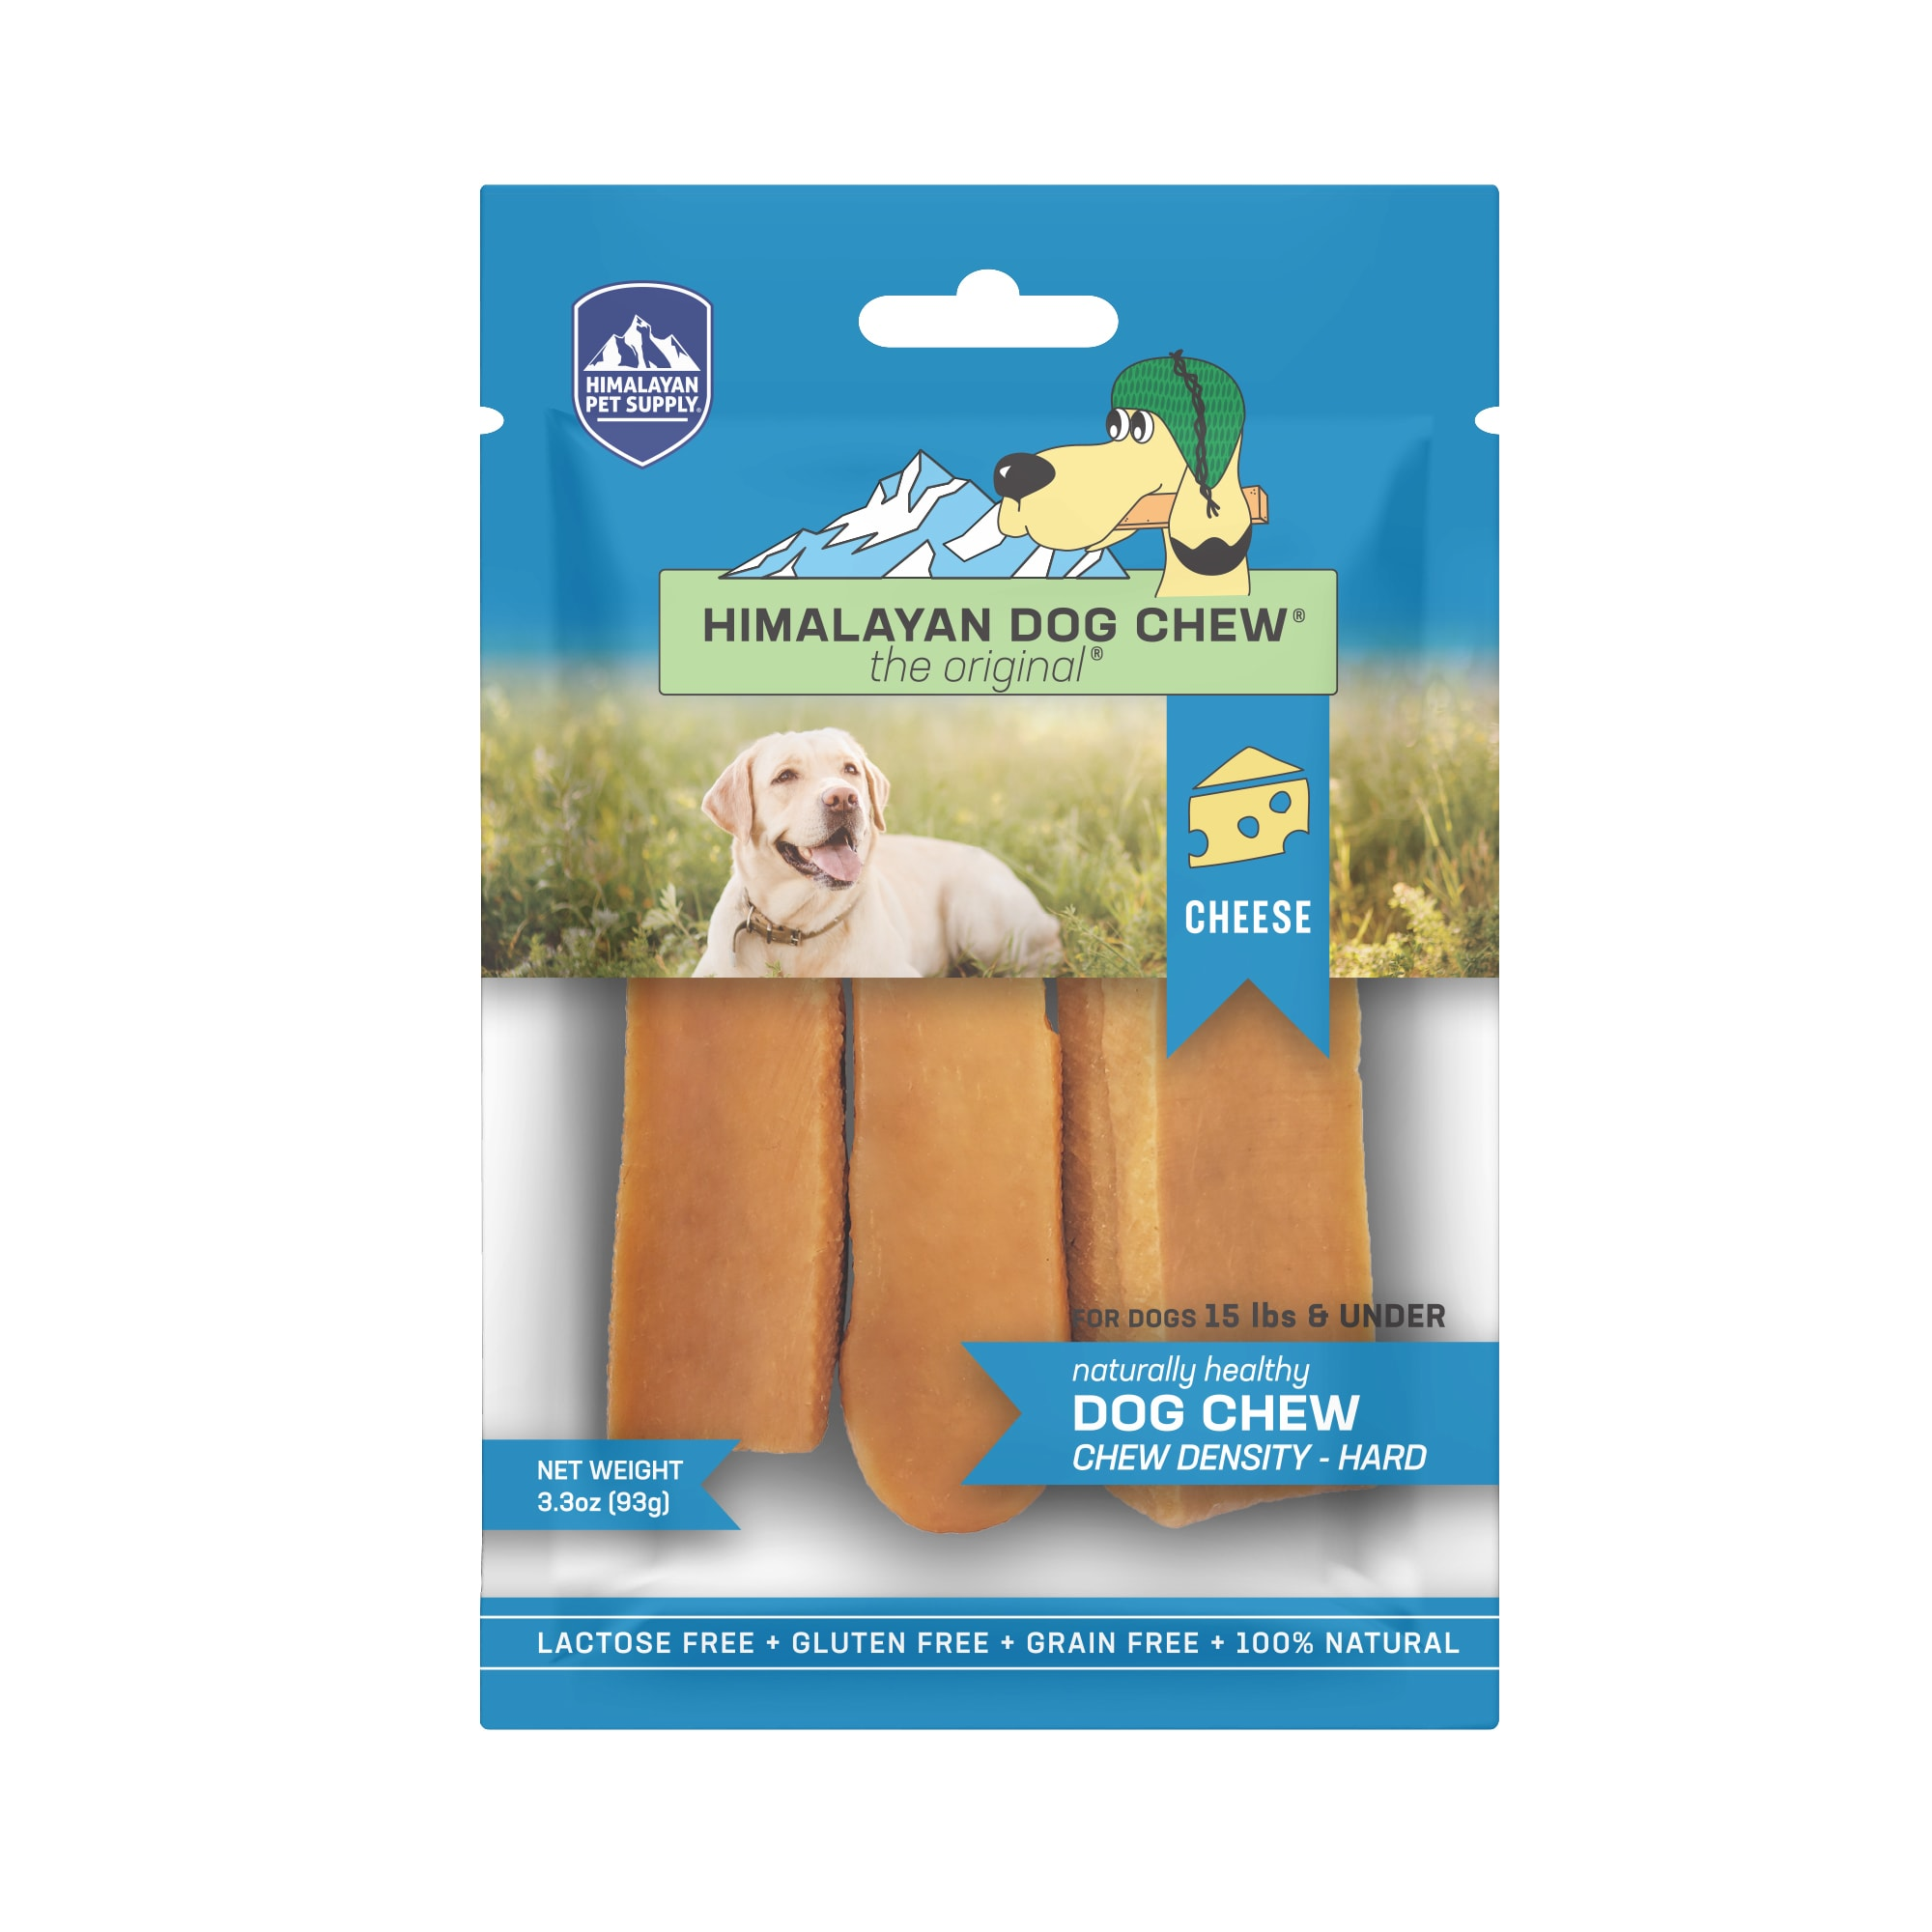 Himalayan Dog Chew Chews